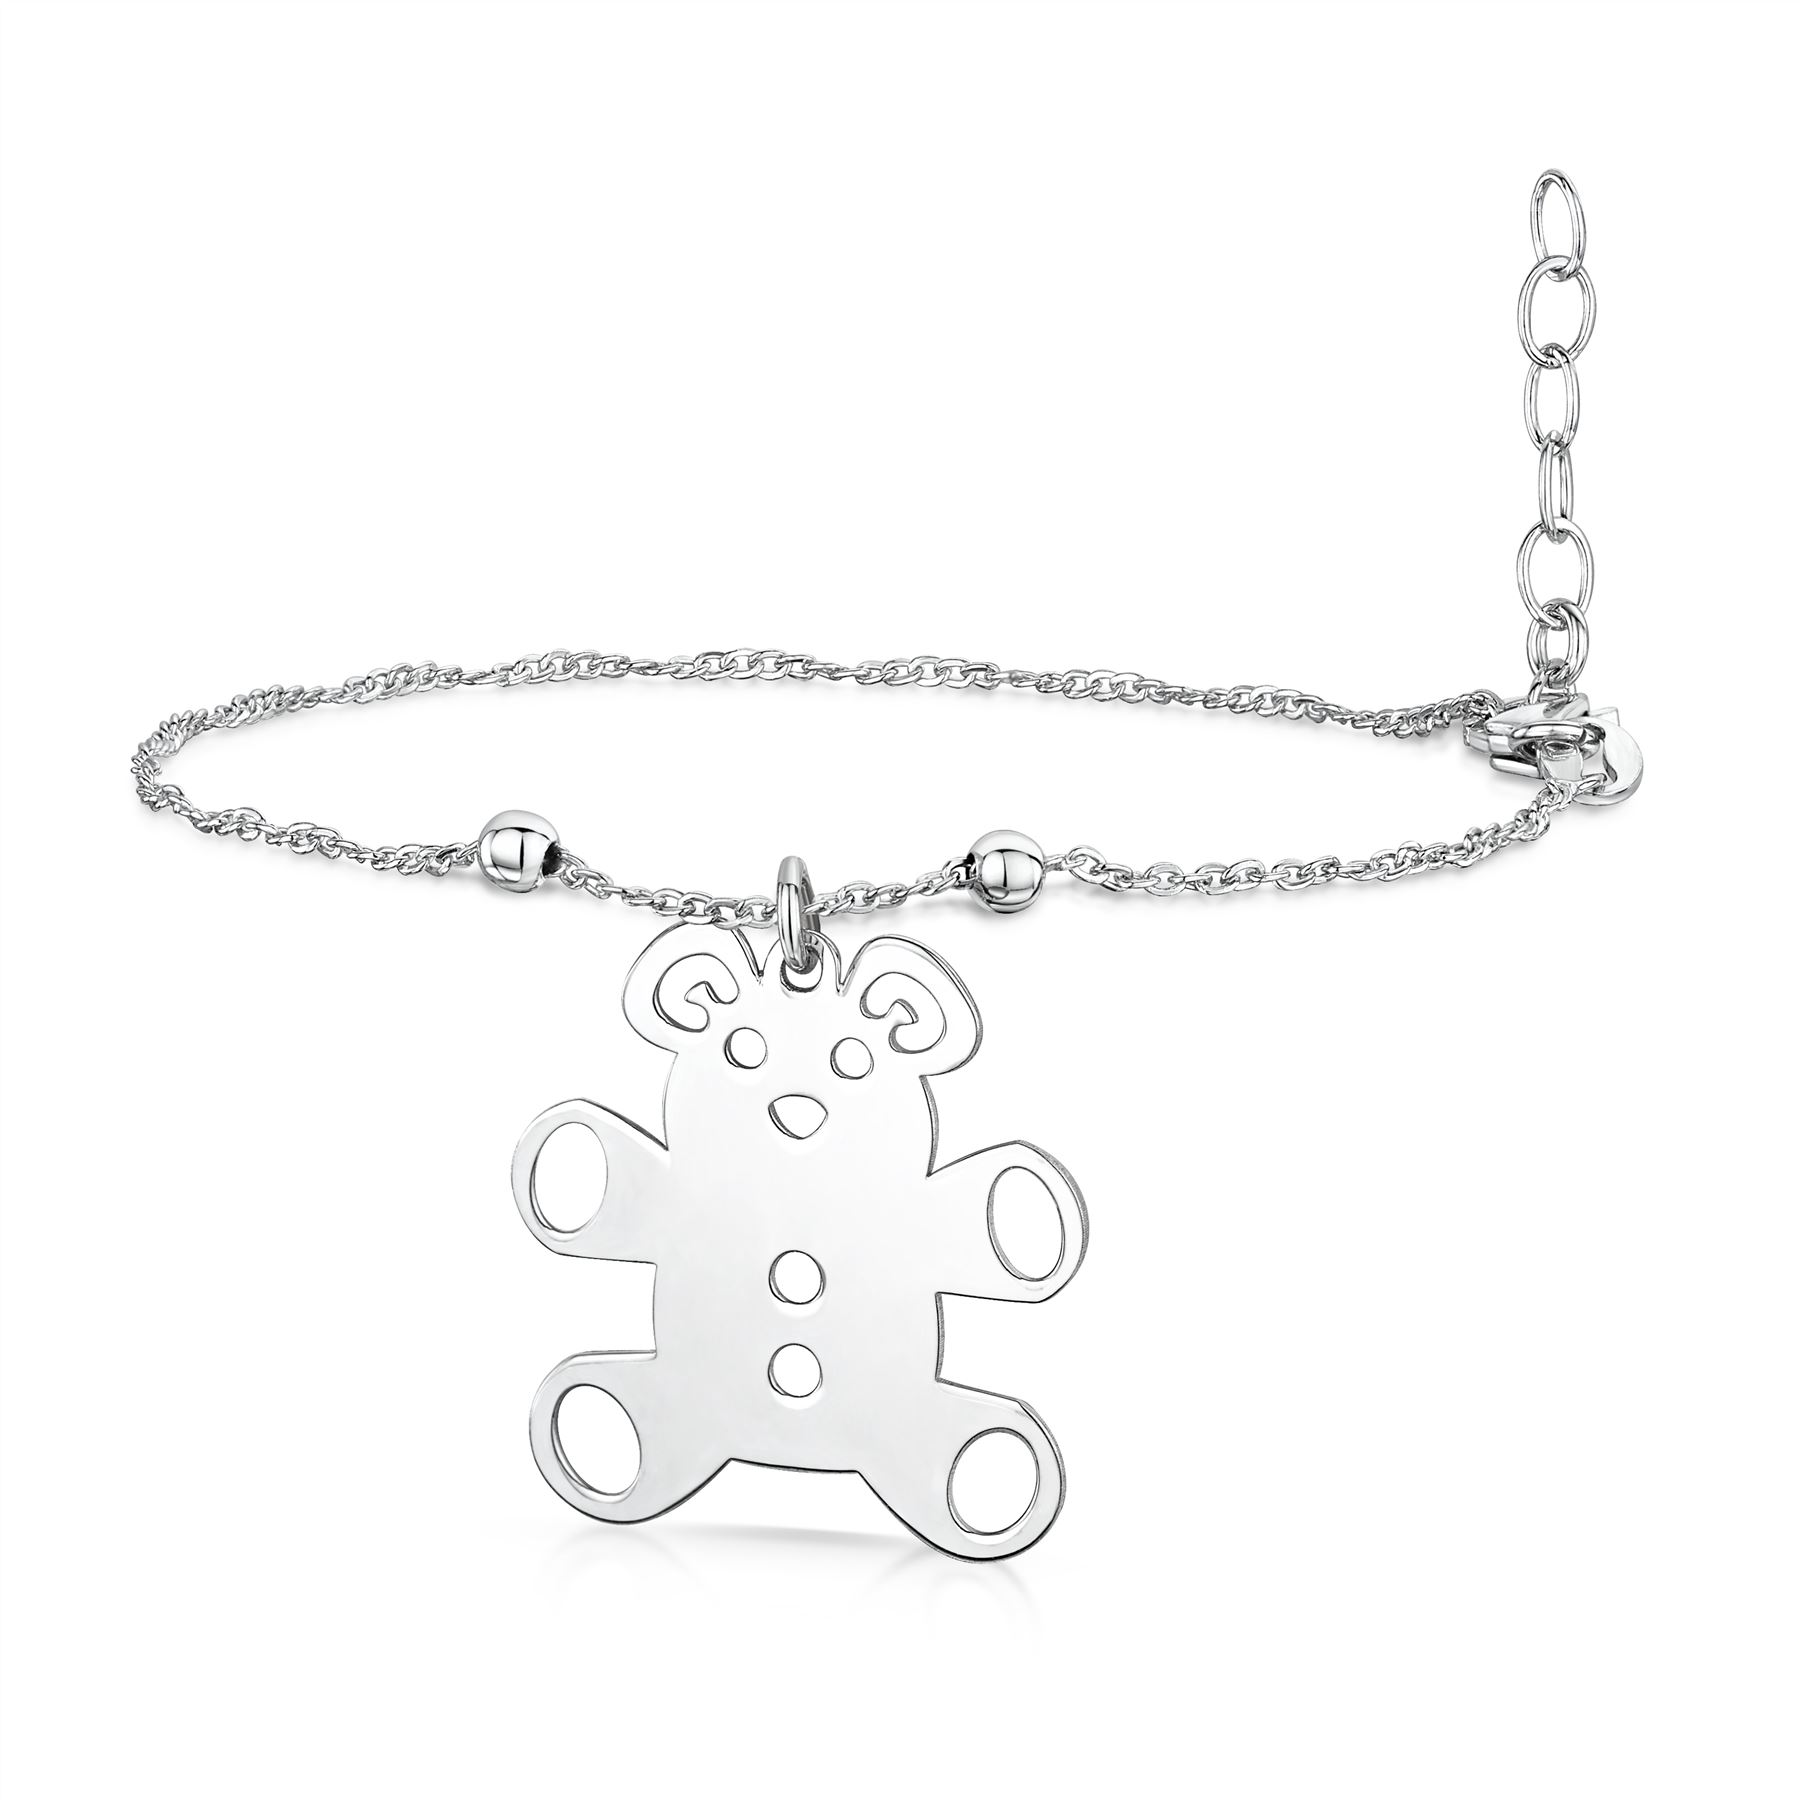 Amberta-Jewelry-925-Sterling-Silver-Adjustable-Bracelet-Italian-Bangle-for-Women miniature 33